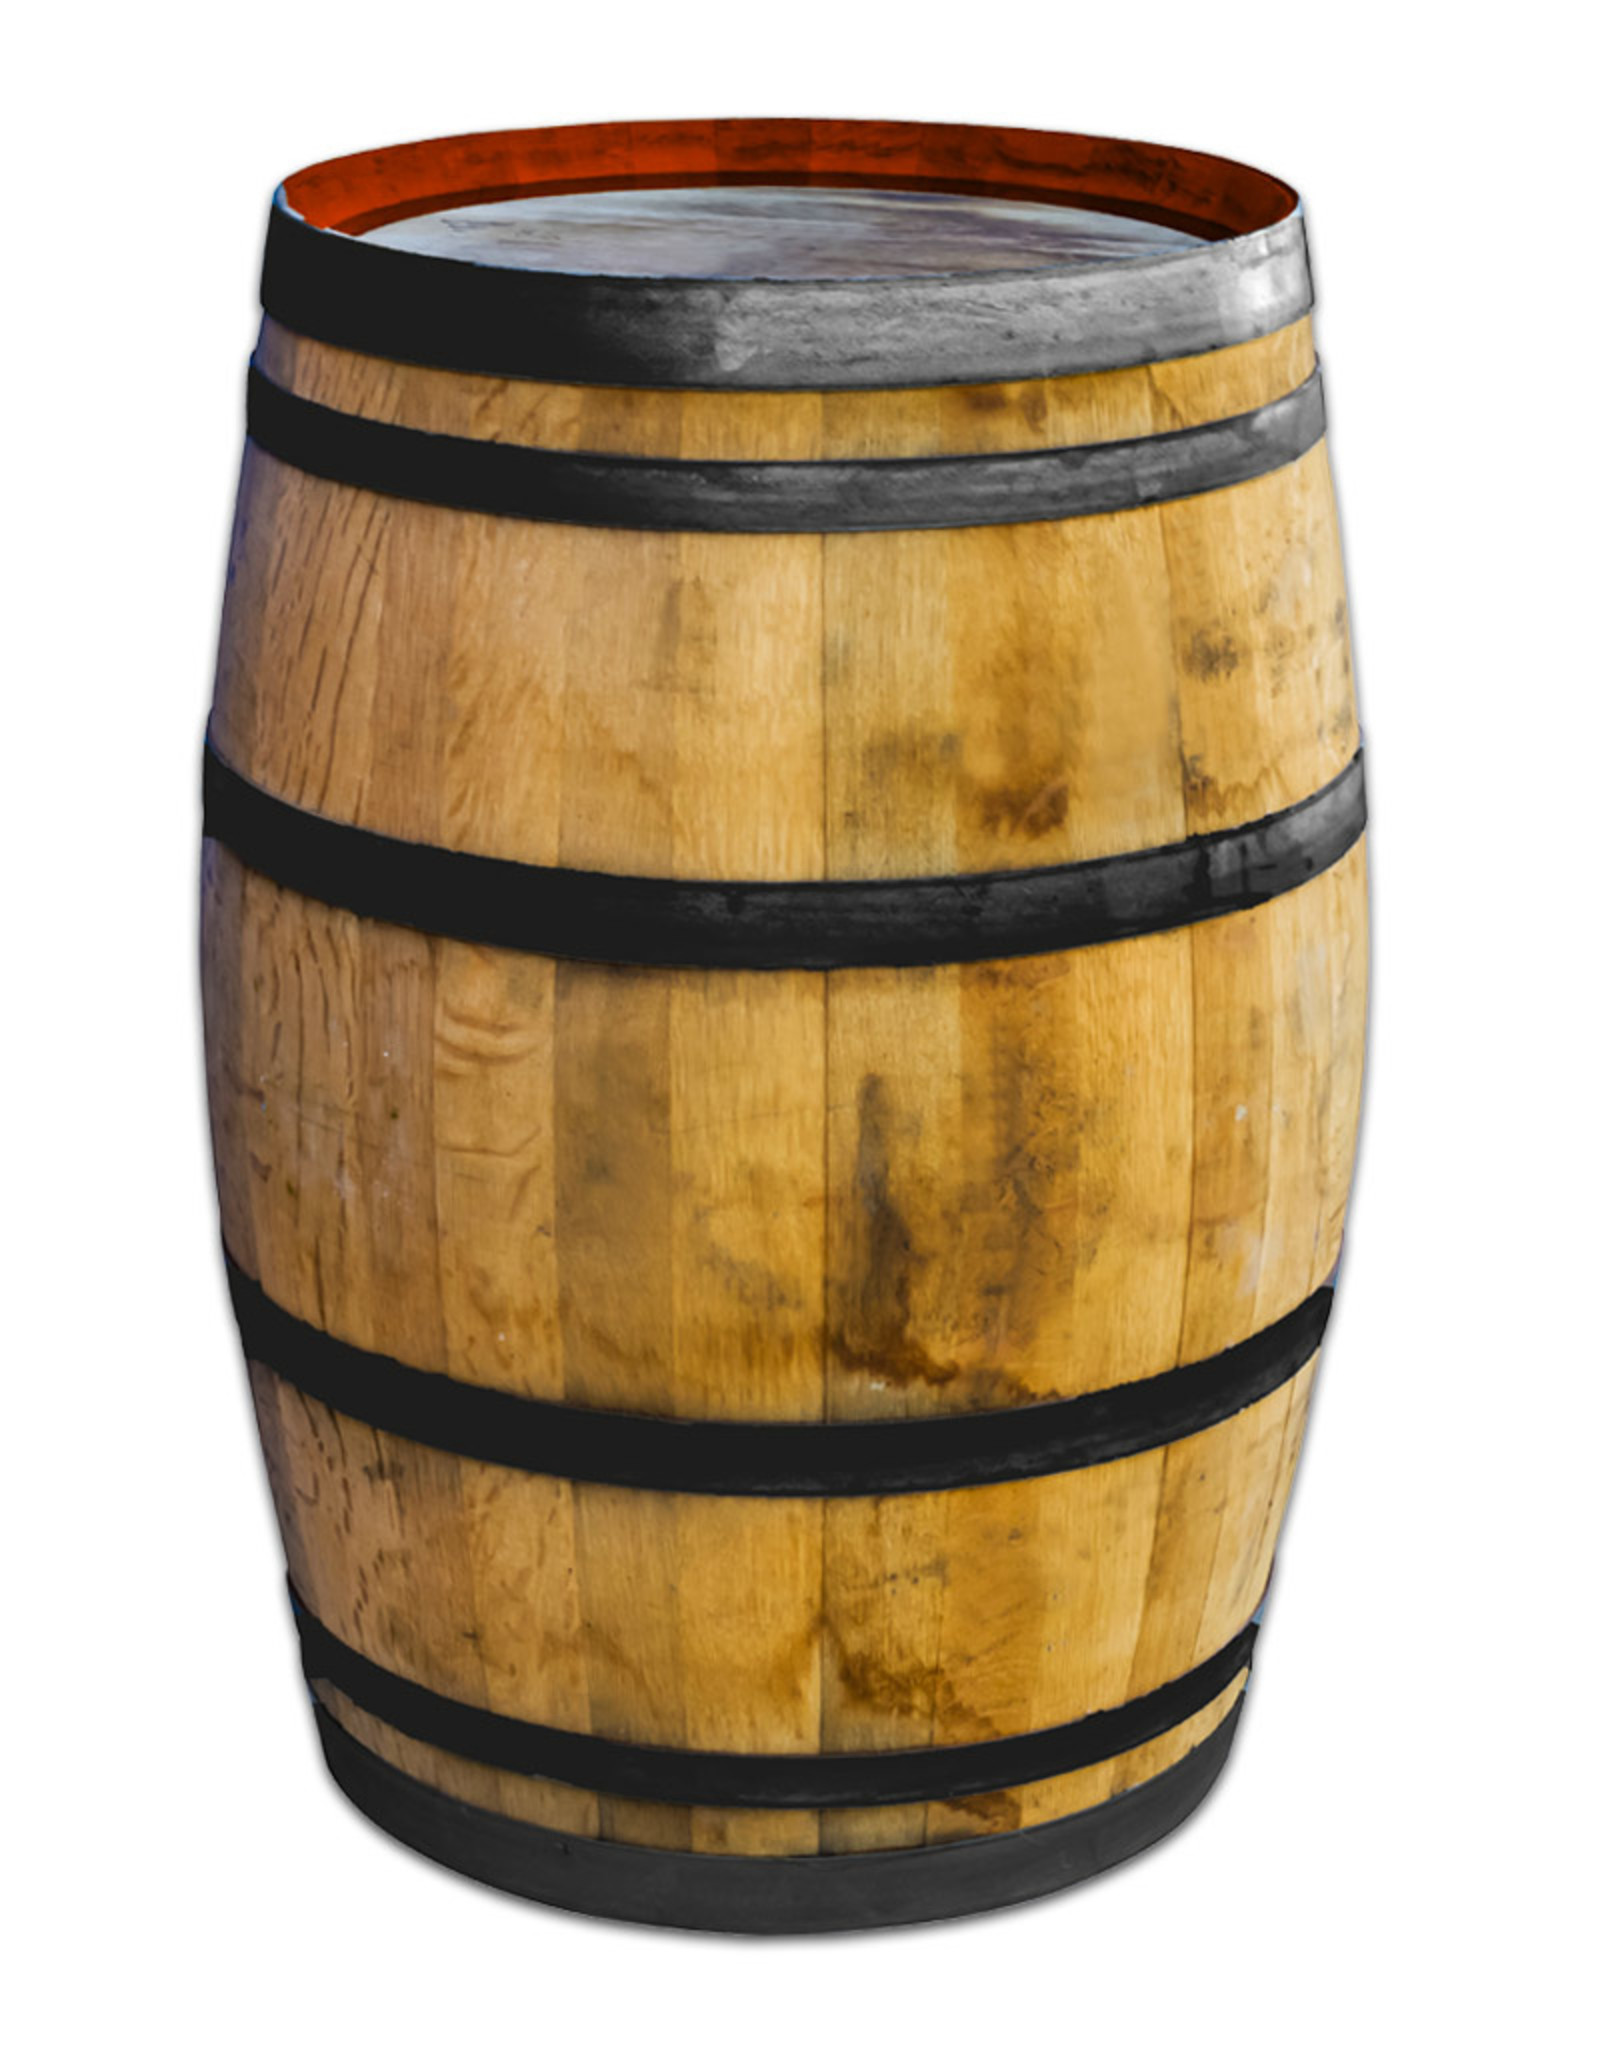 225 L PORT WINE BARREL TAWNY AMERICAN OAK